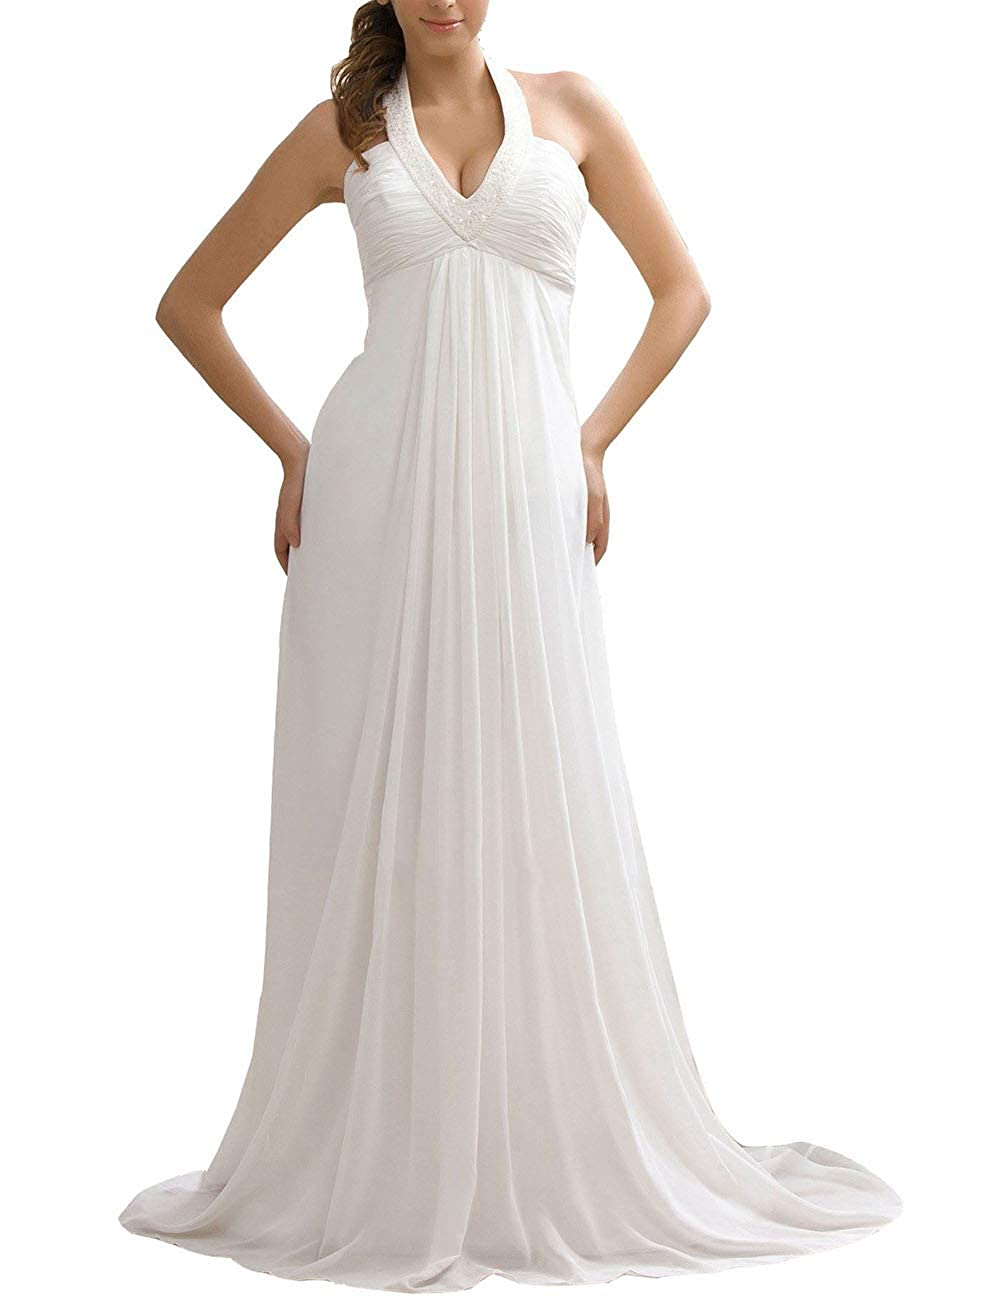 Halter Beach Wedding Dress Empire Waist Chiffon Bridal Dresses Beaded At Amazon Women's Clothing Store: Beach Wedding Dress Empire Dresses At Websimilar.org